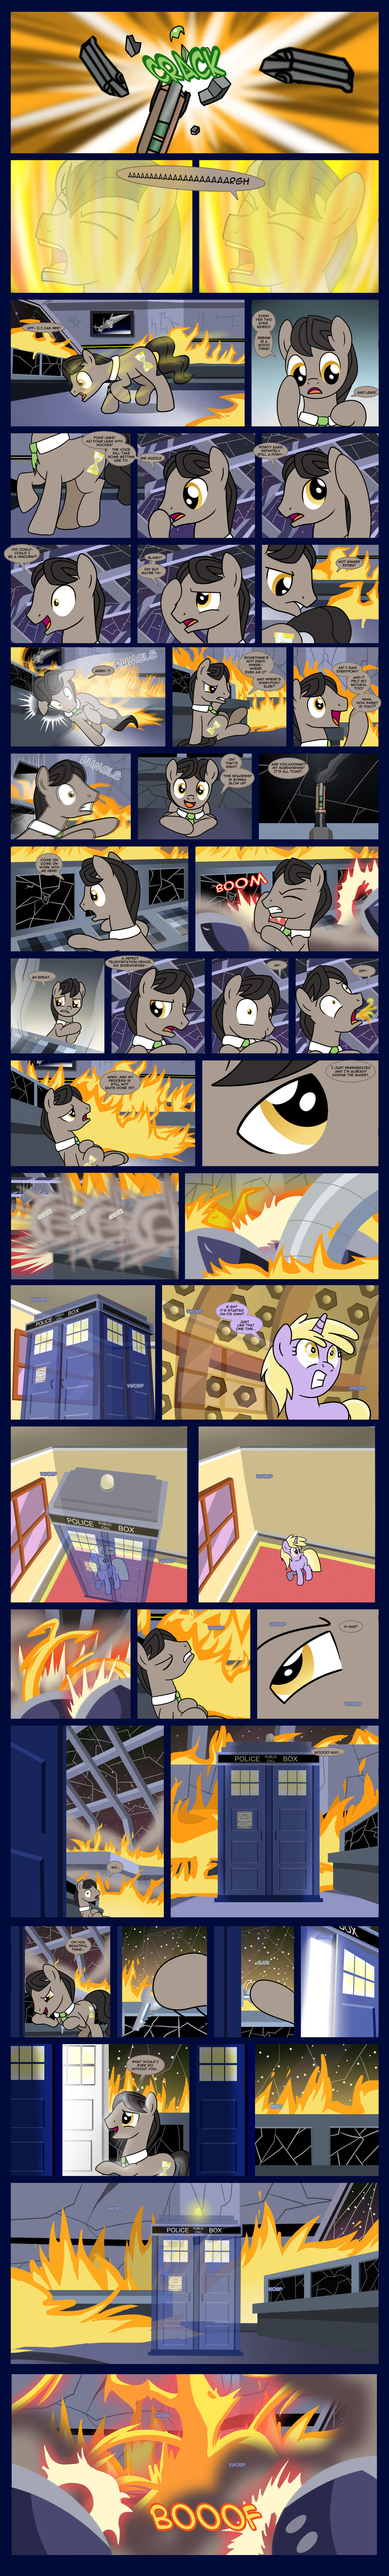 Doctor Whooves - Rebirth Pt 10 by Edowaado